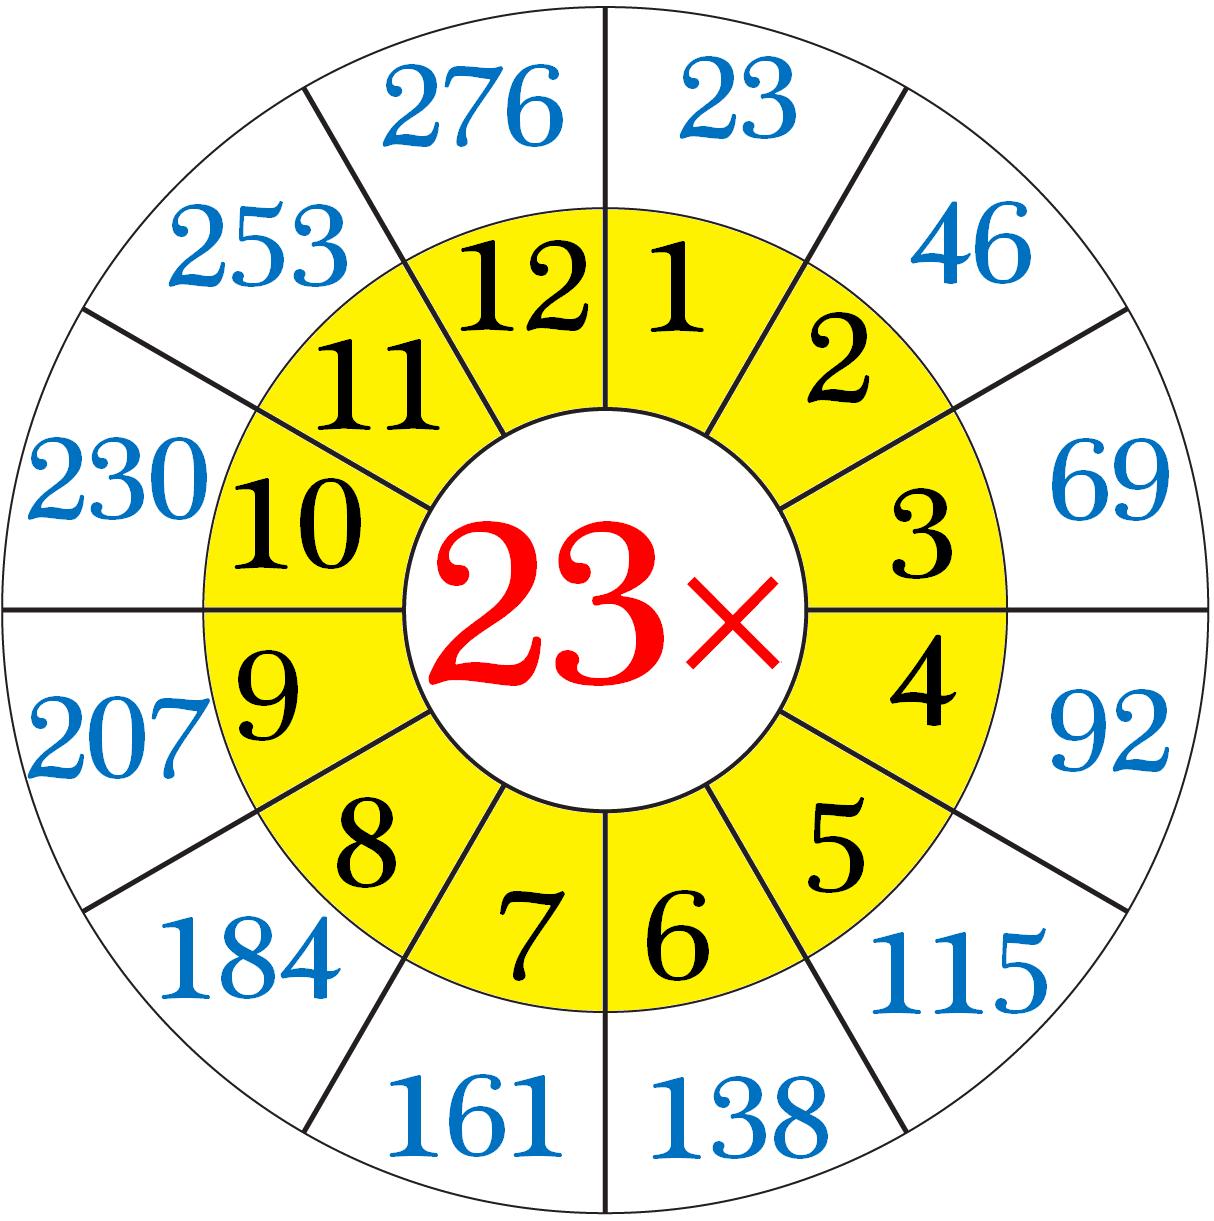 23 Multiplication Table Maths